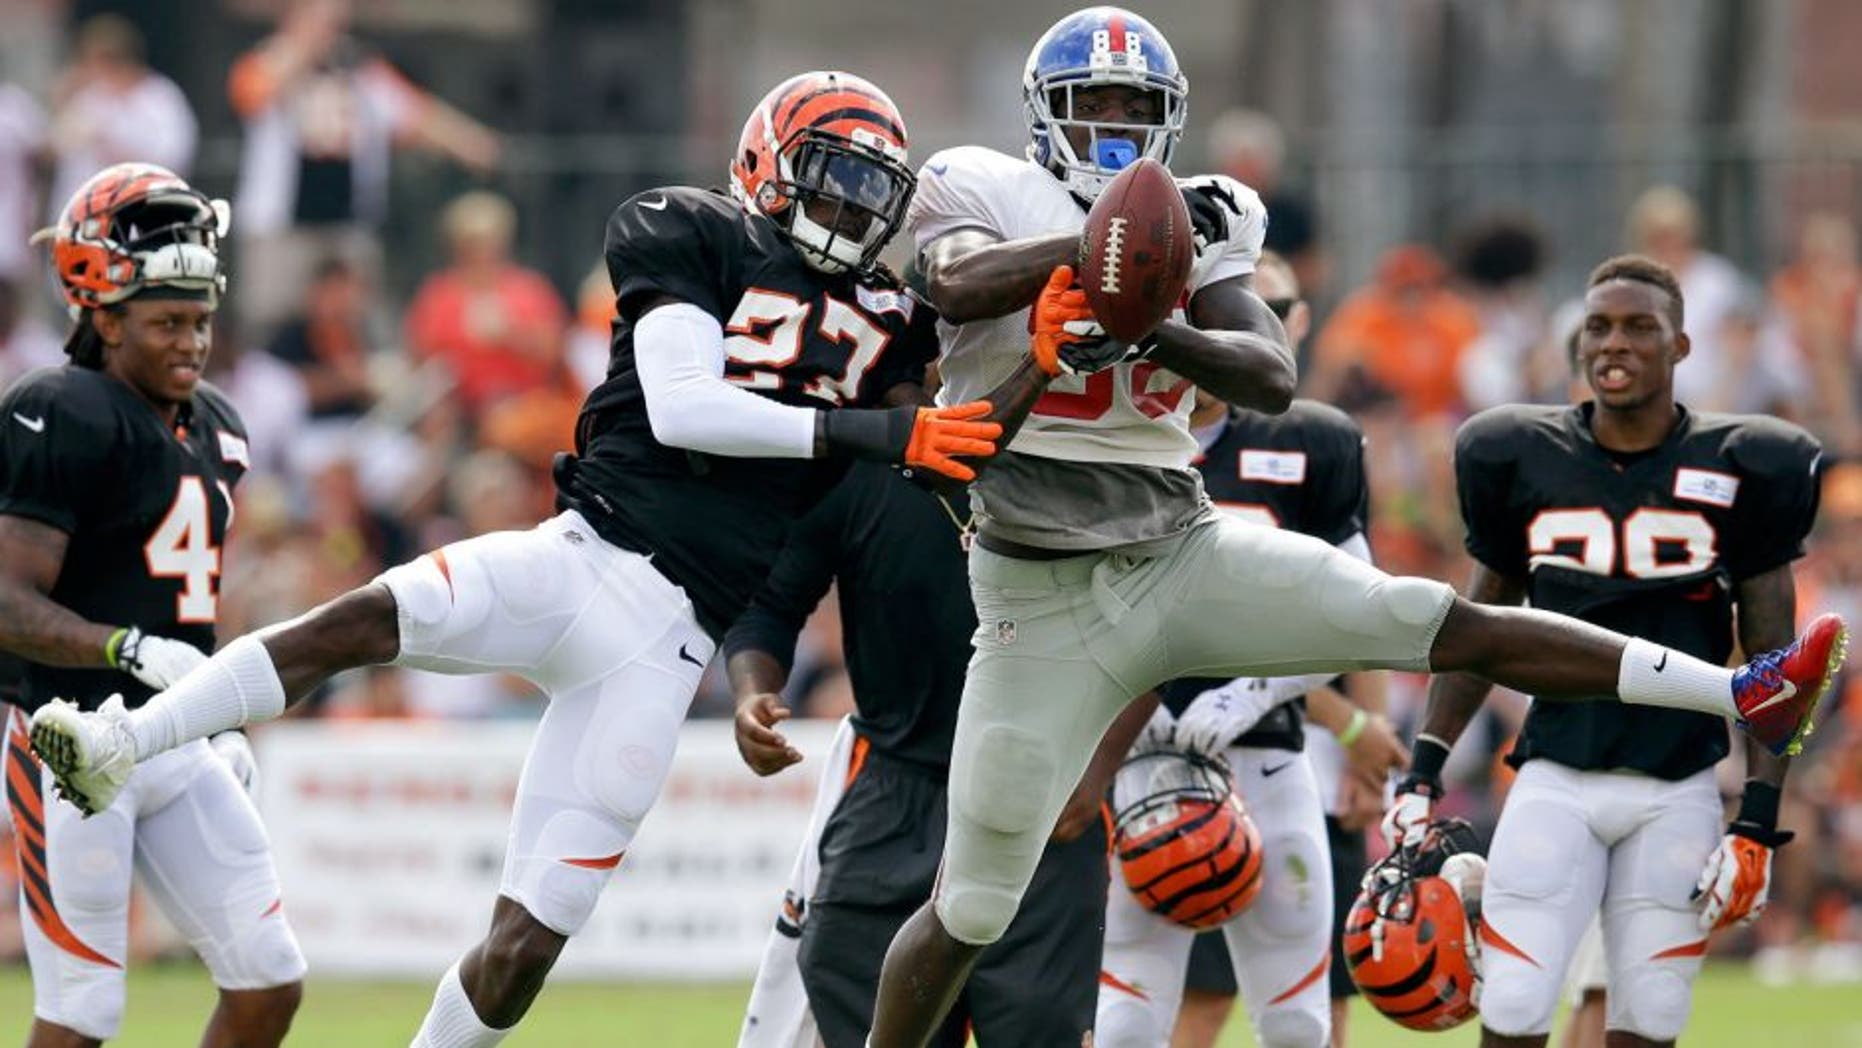 Cincinnati Bengals cornerback Dre Kirkpatrick (27) blocks a pass to New York Giants wide receiver Corey Washinton during NFL football training camp, Tuesday, Aug. 11, 2015, in Cincinnati. (AP Photo/John Minchillo)